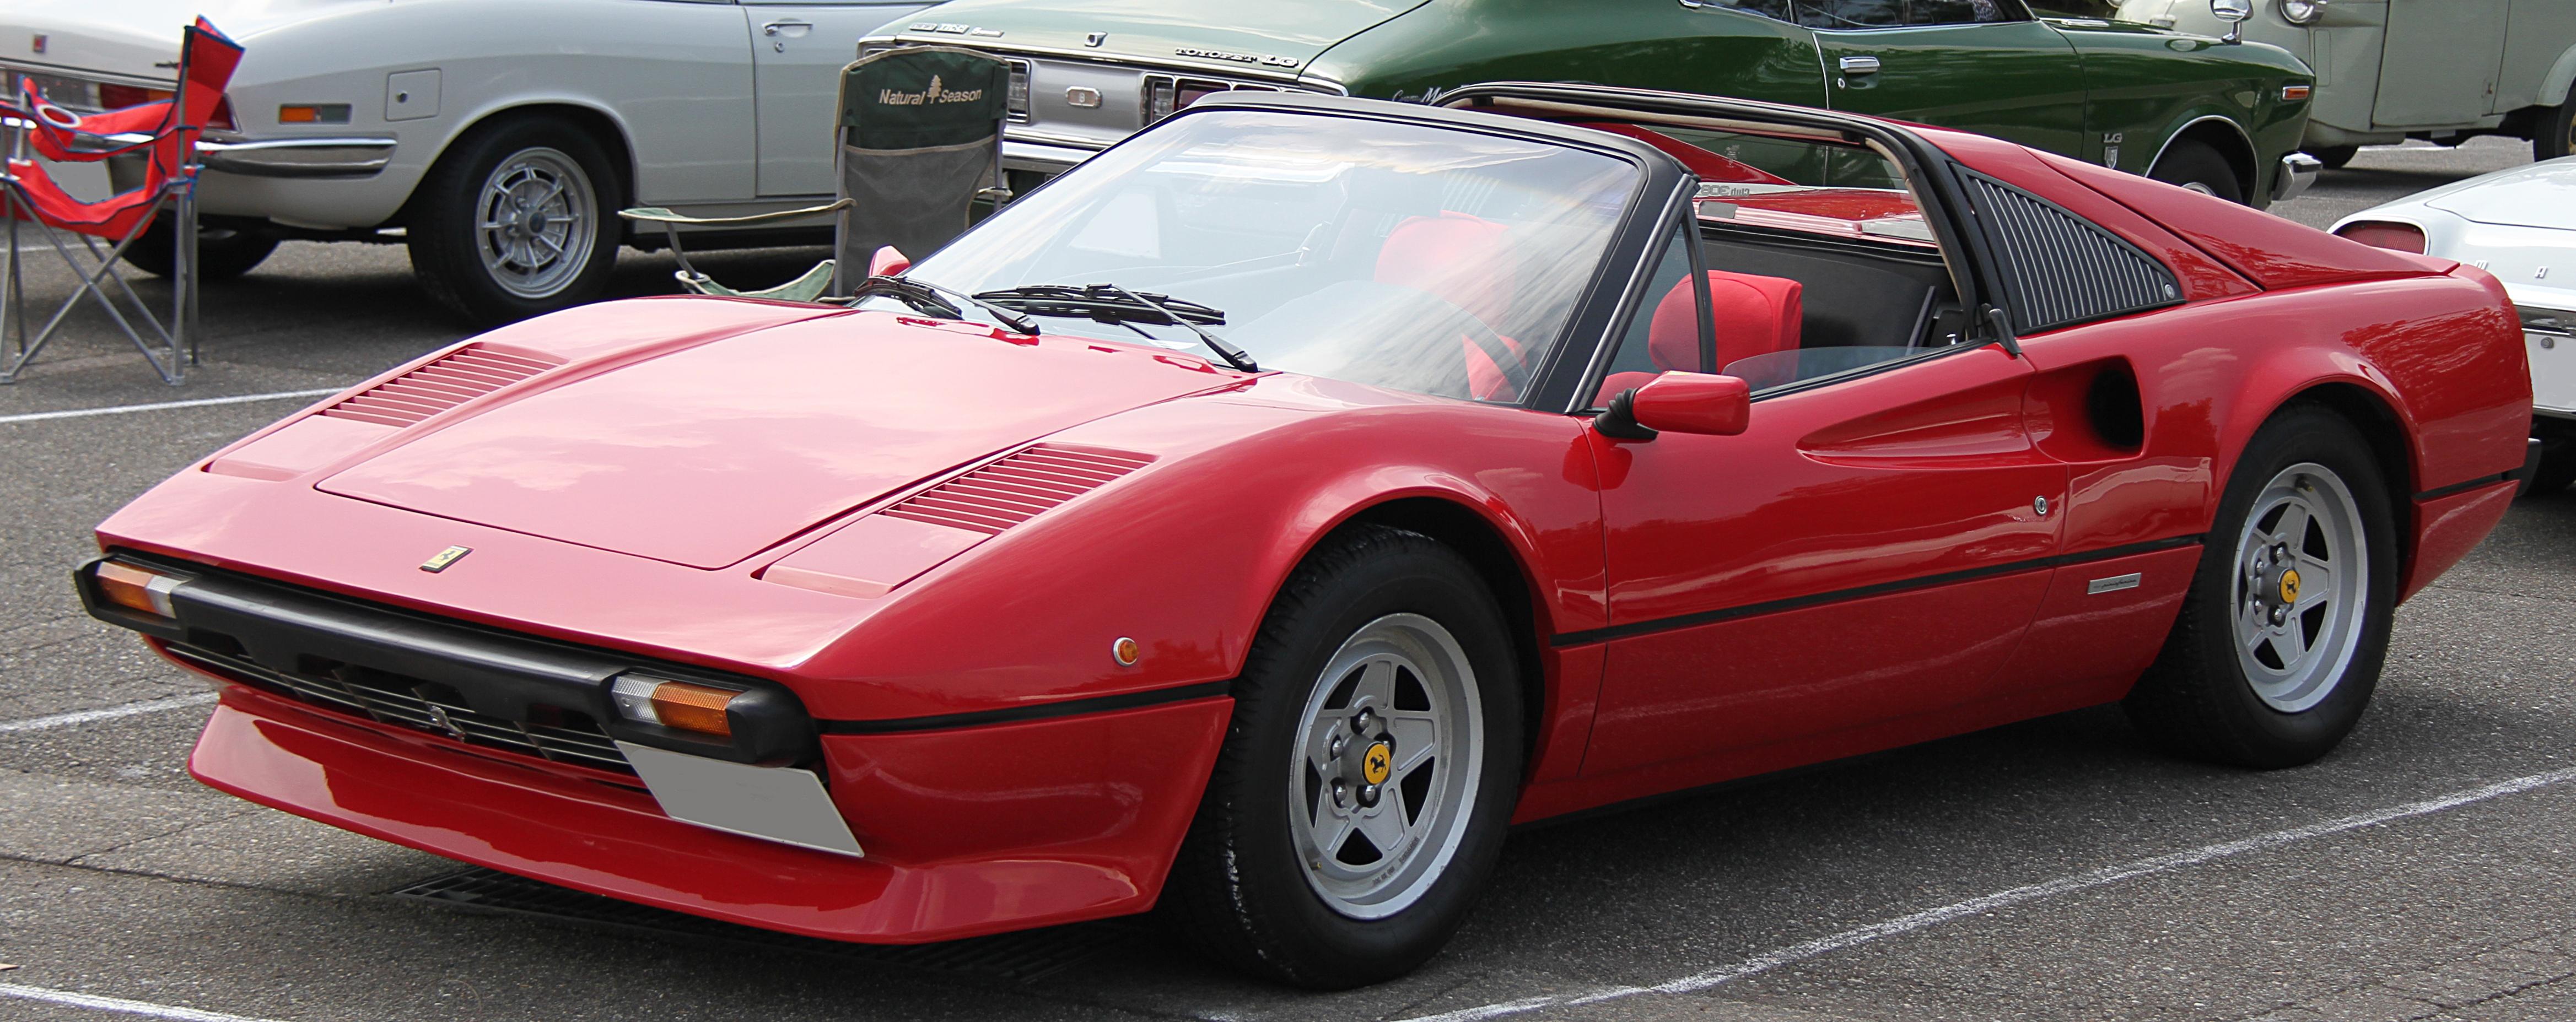 File 1979 Ferrari 308gts Jpg Wikimedia Commons